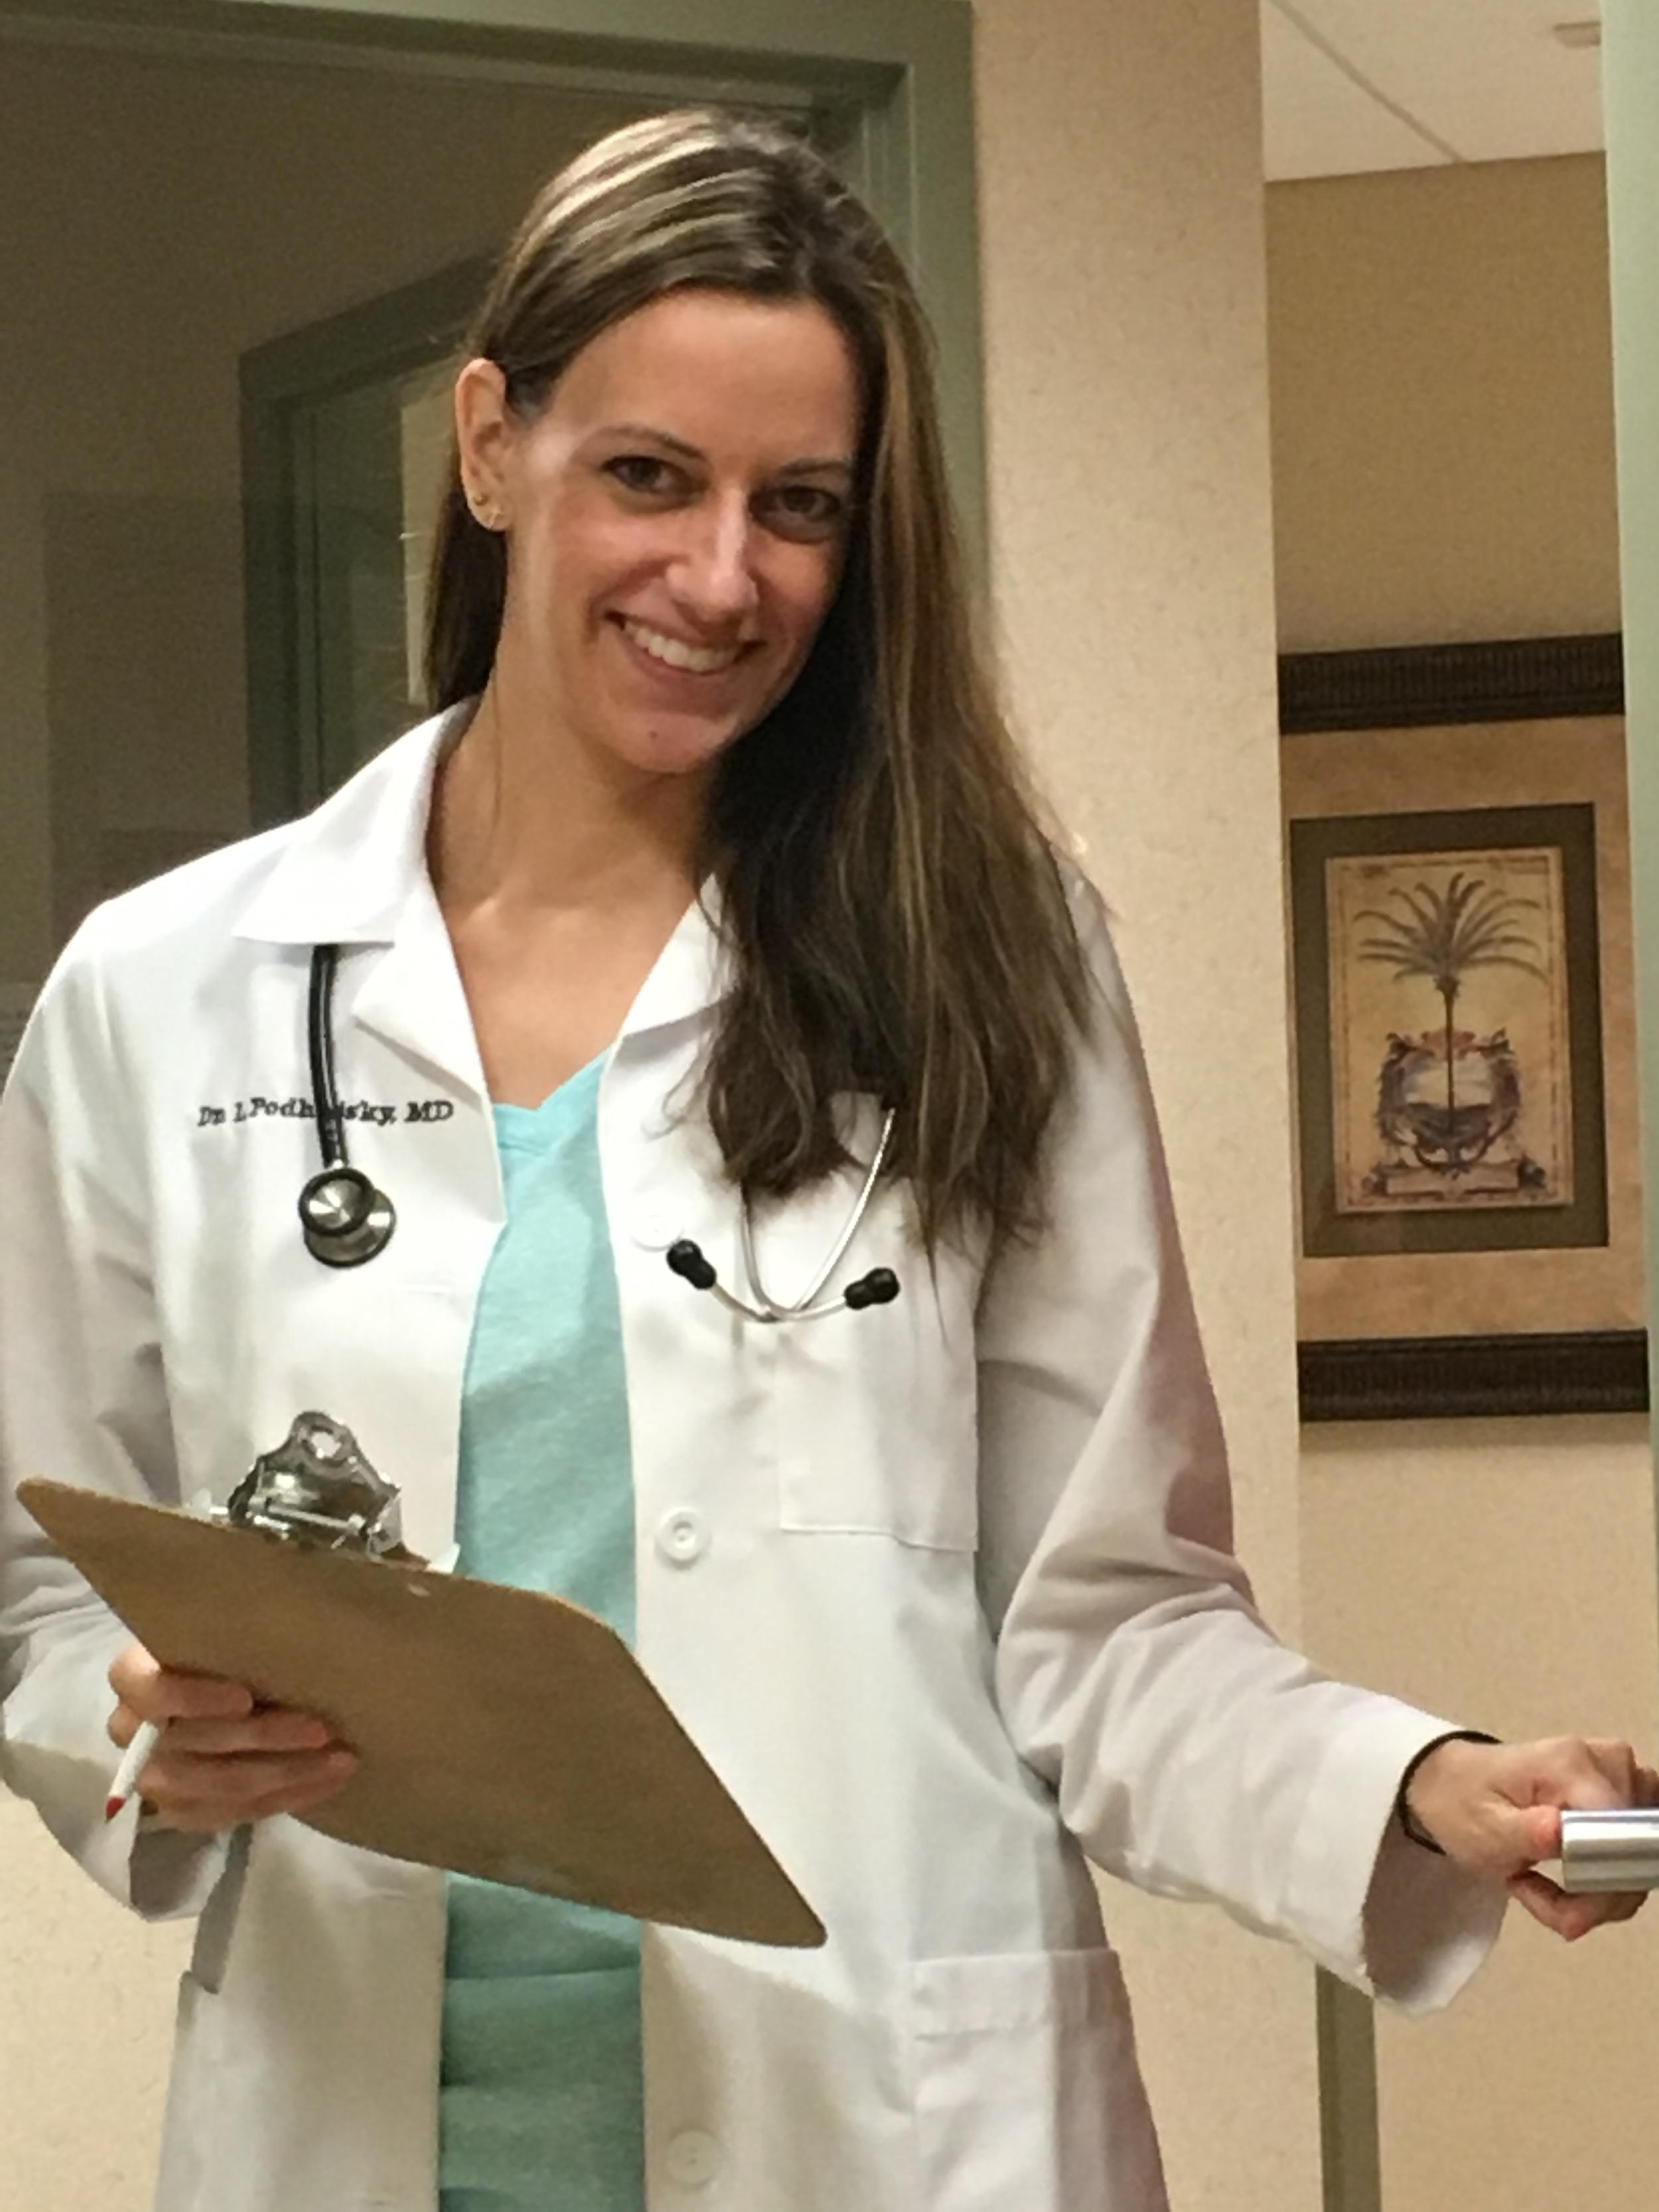 Lindsay Podhajsky, MD // Family Practice // University of Kansas